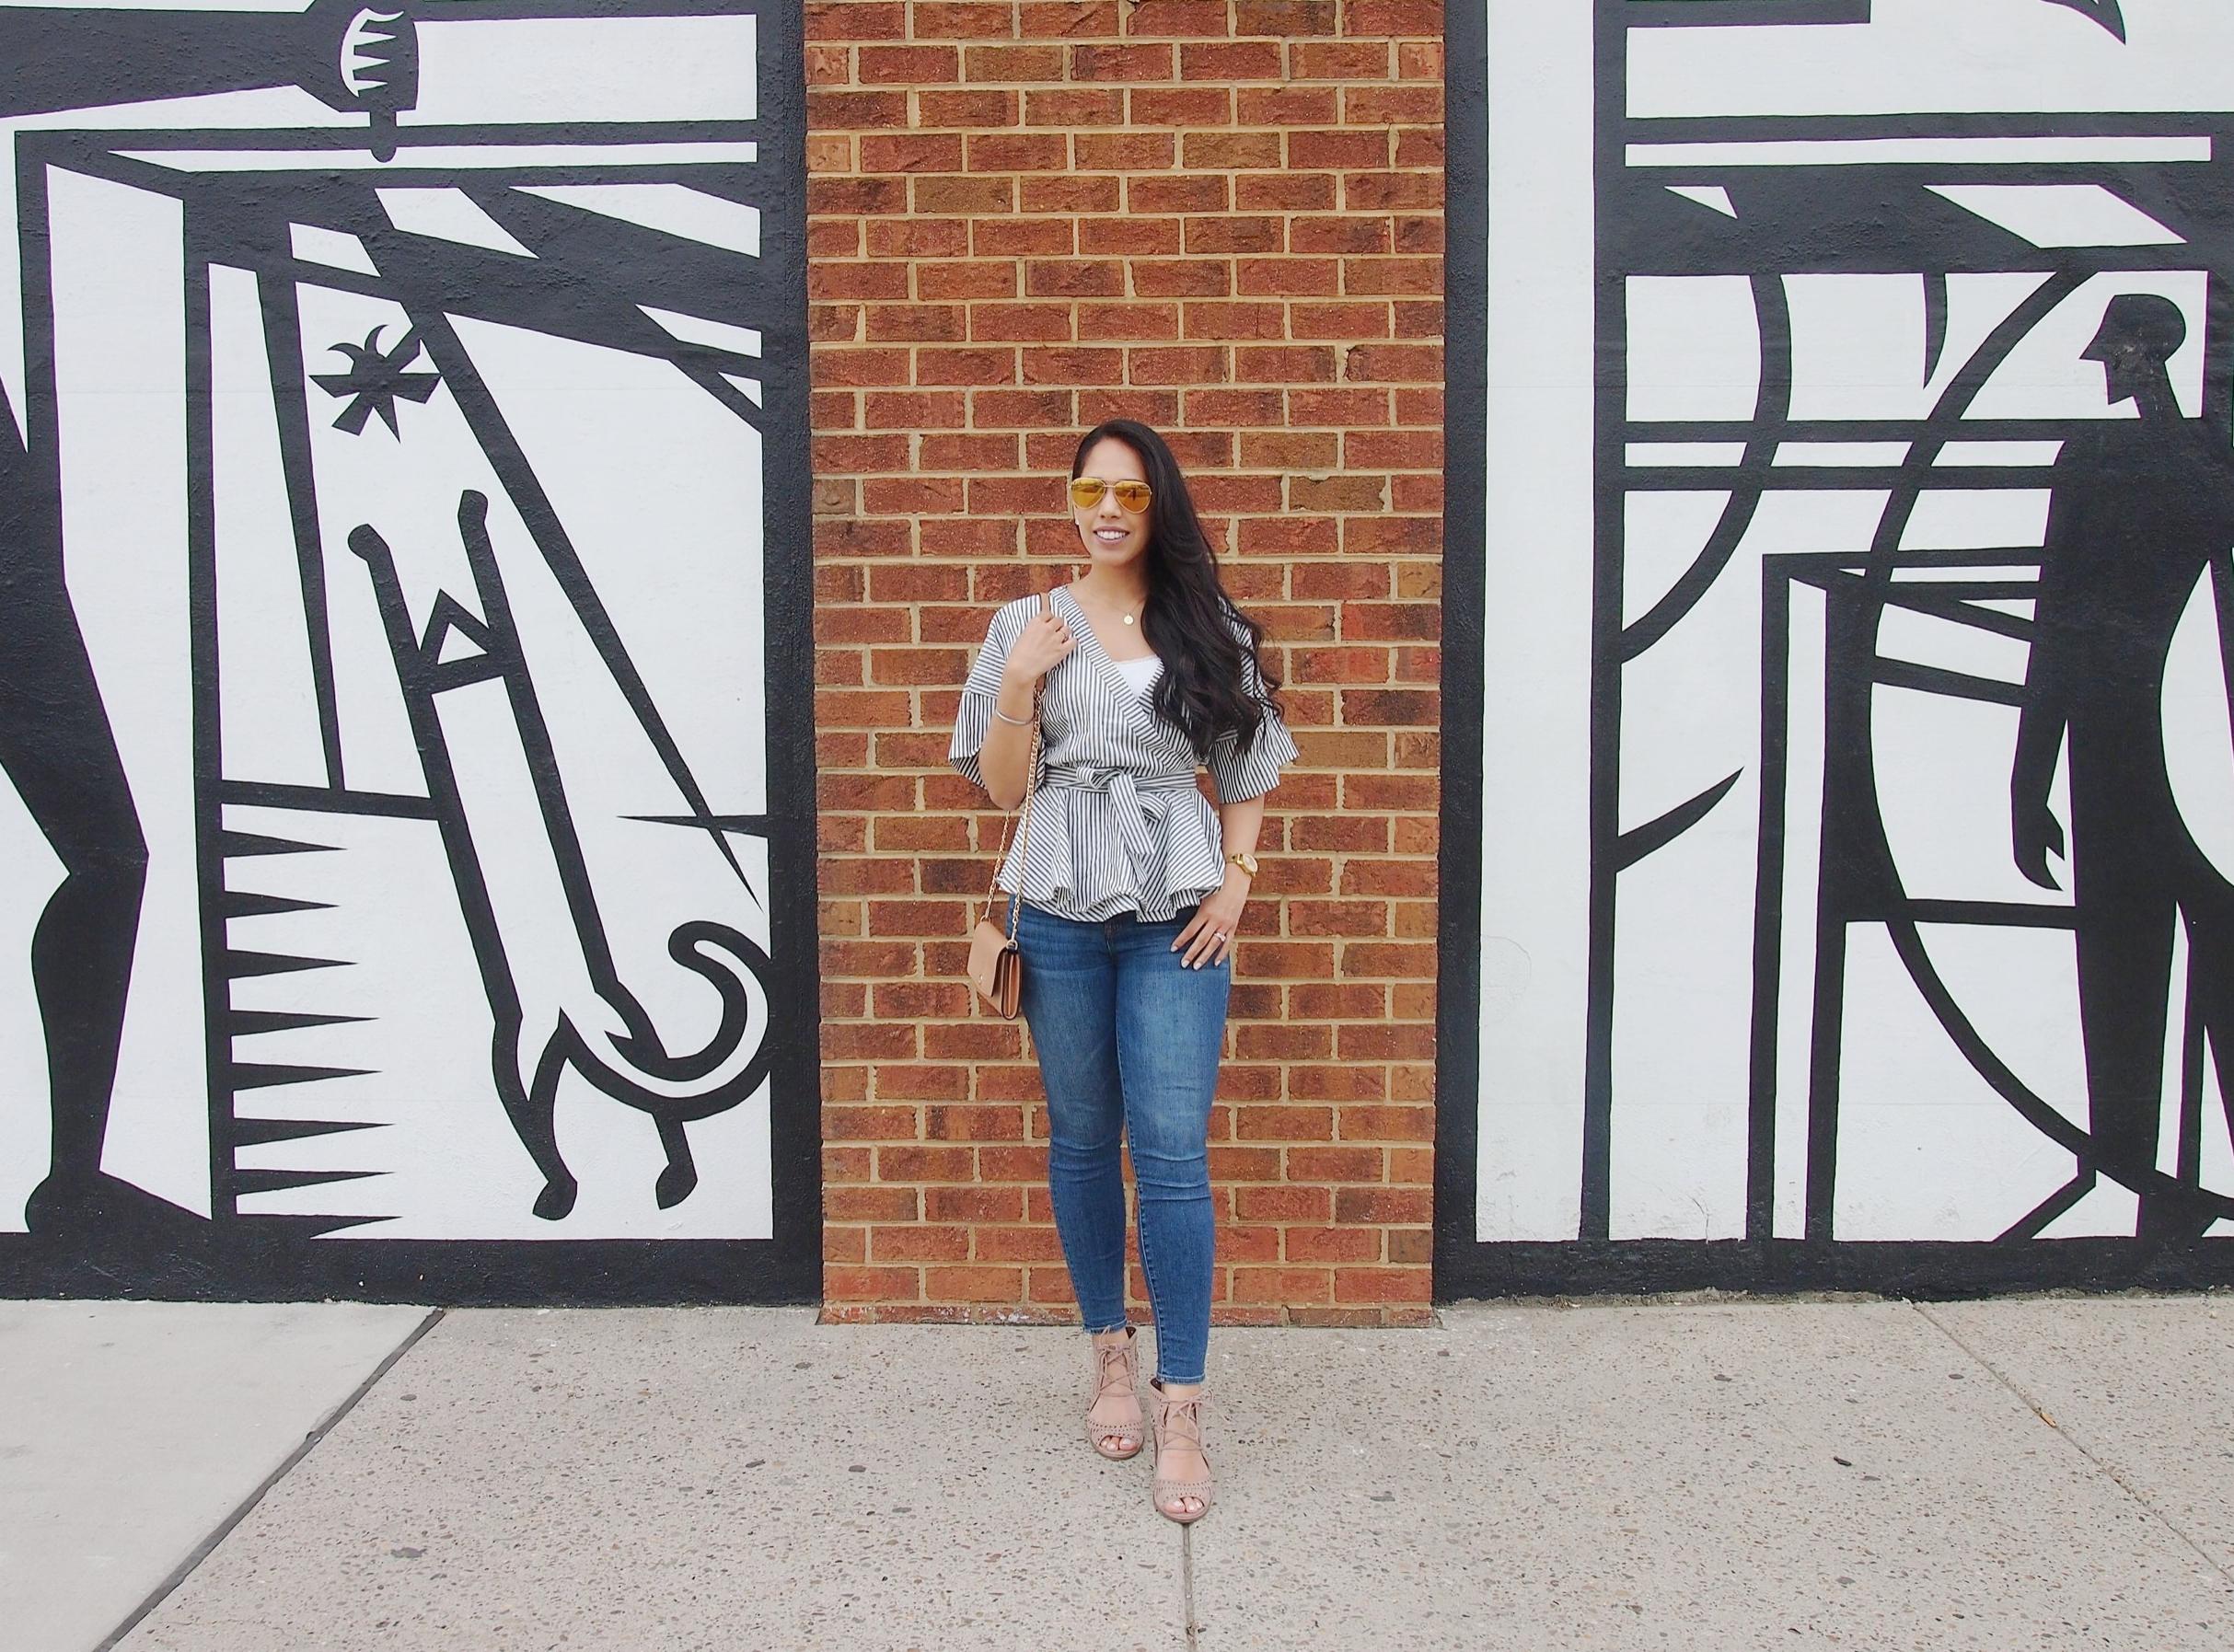 honest-review-SheIn-clothing.JPG